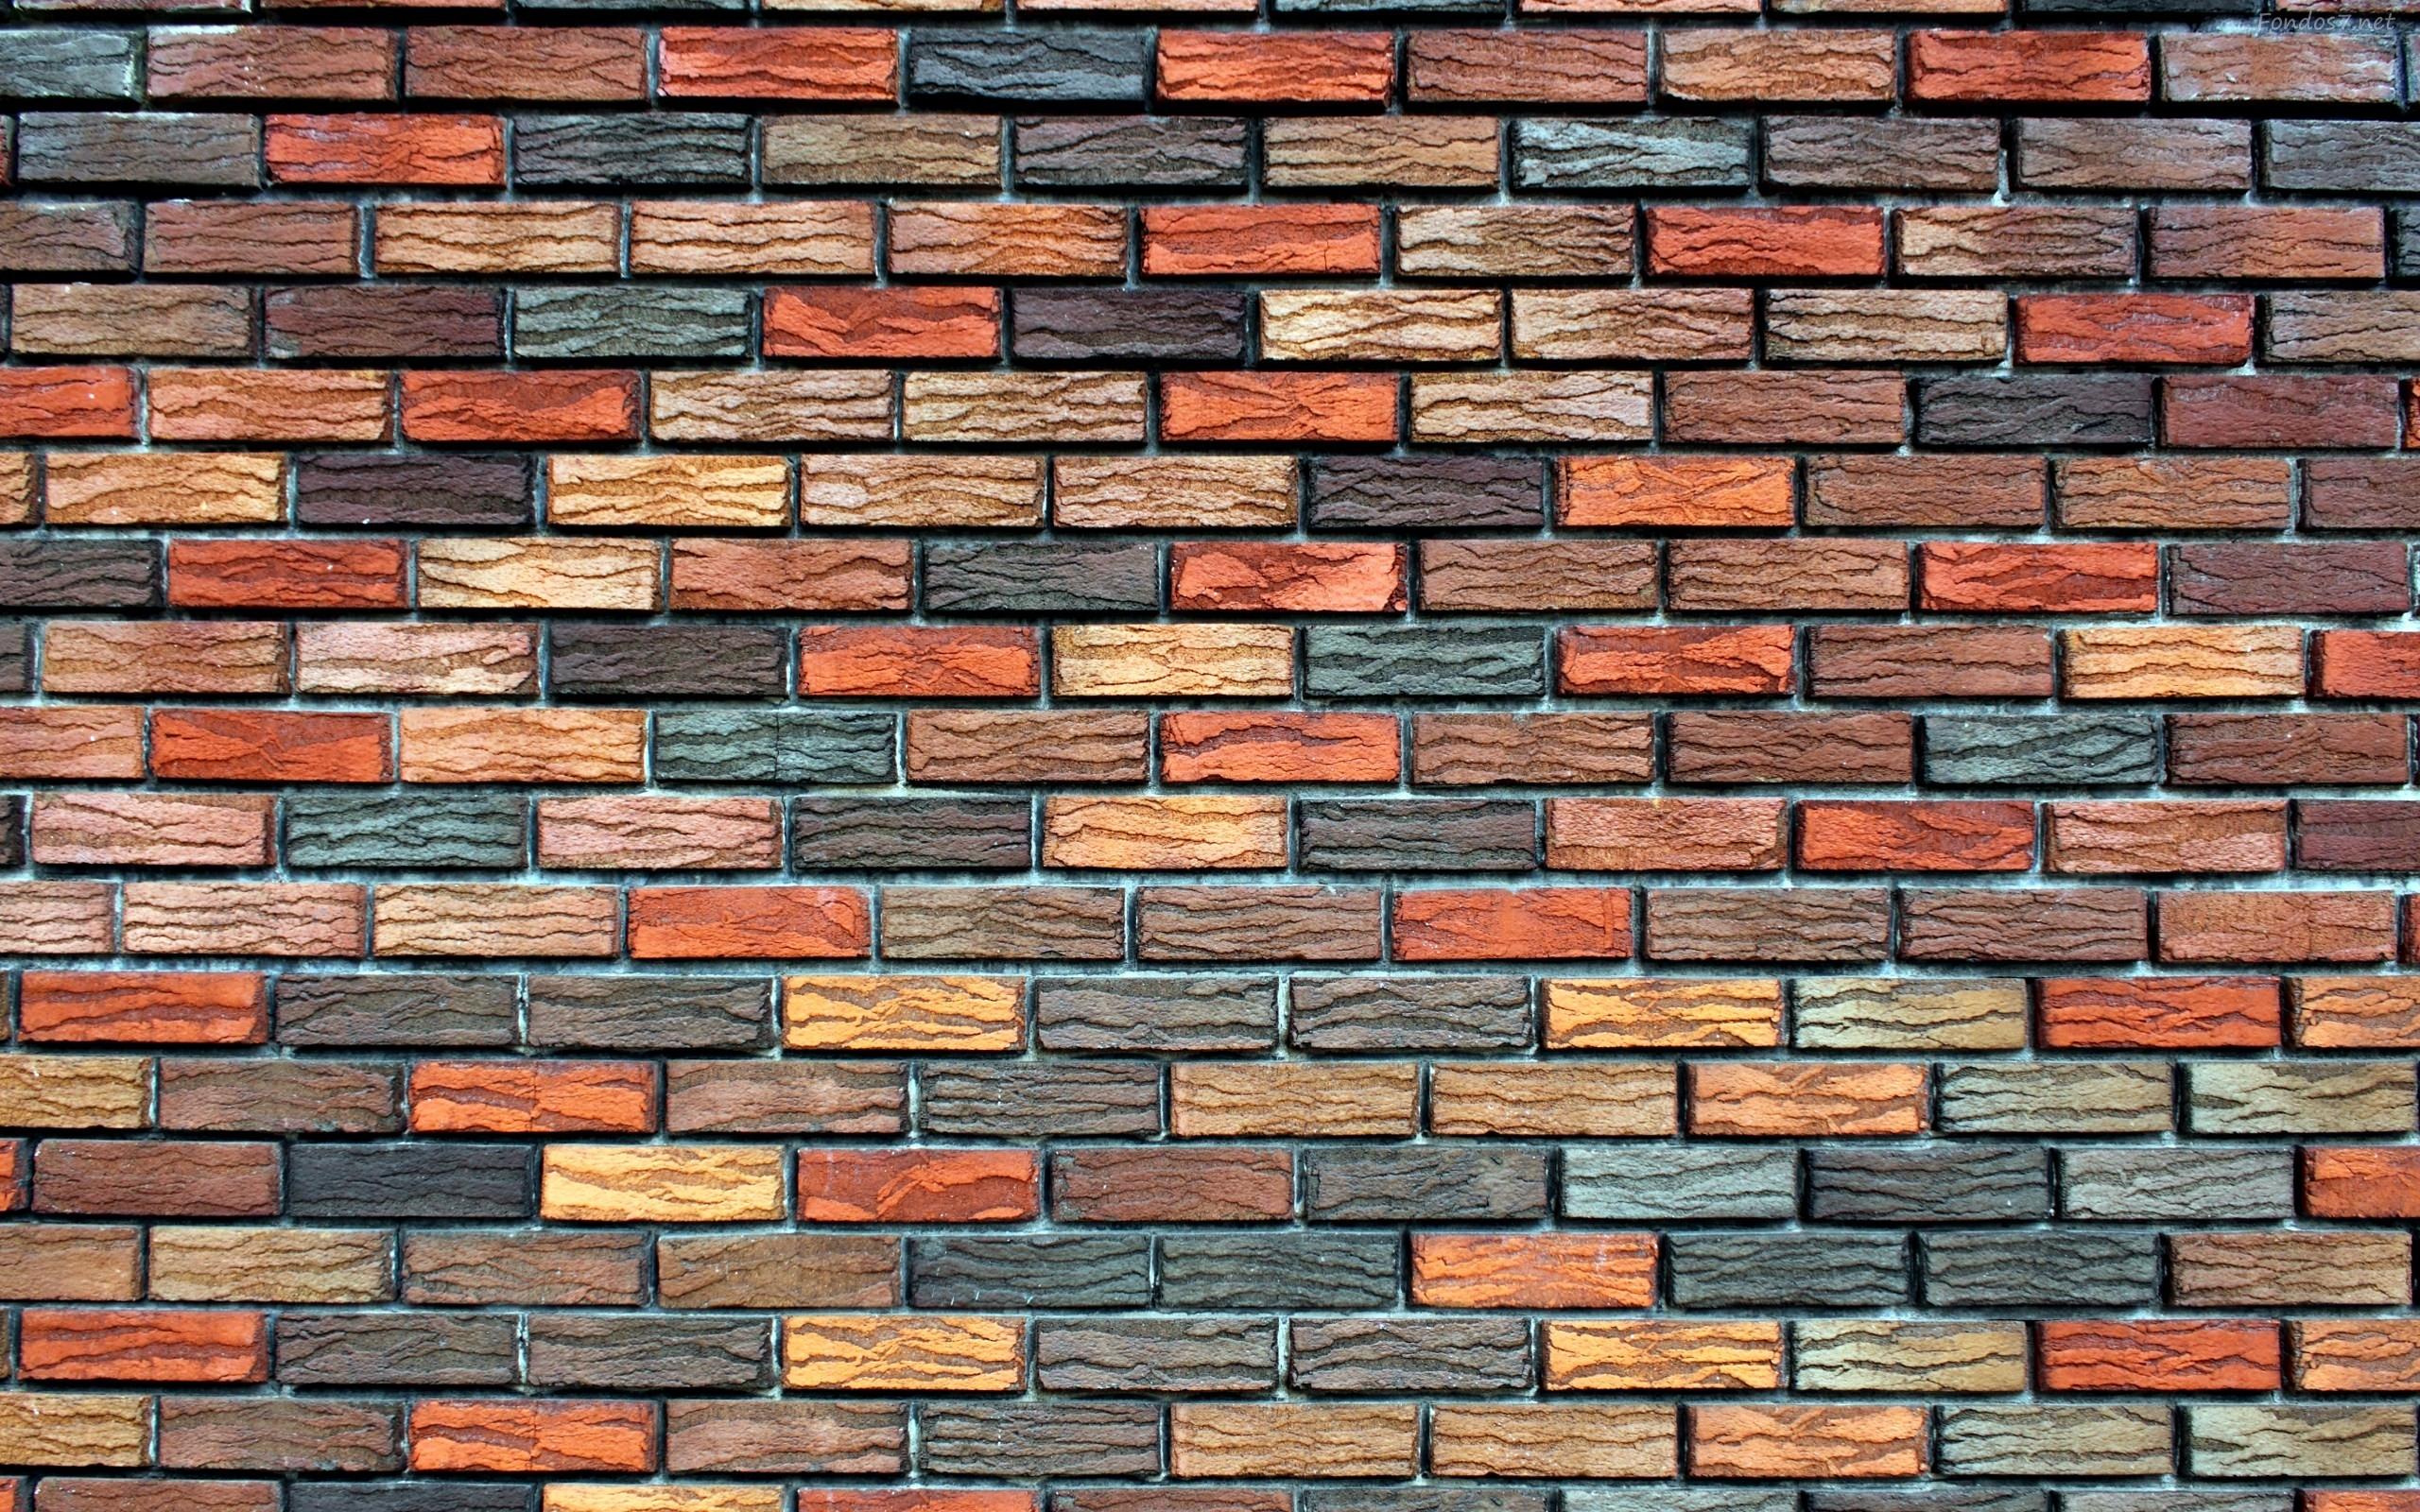 Descargar Fondos de pantalla textura de pared de ladrillos hd 2560x1600